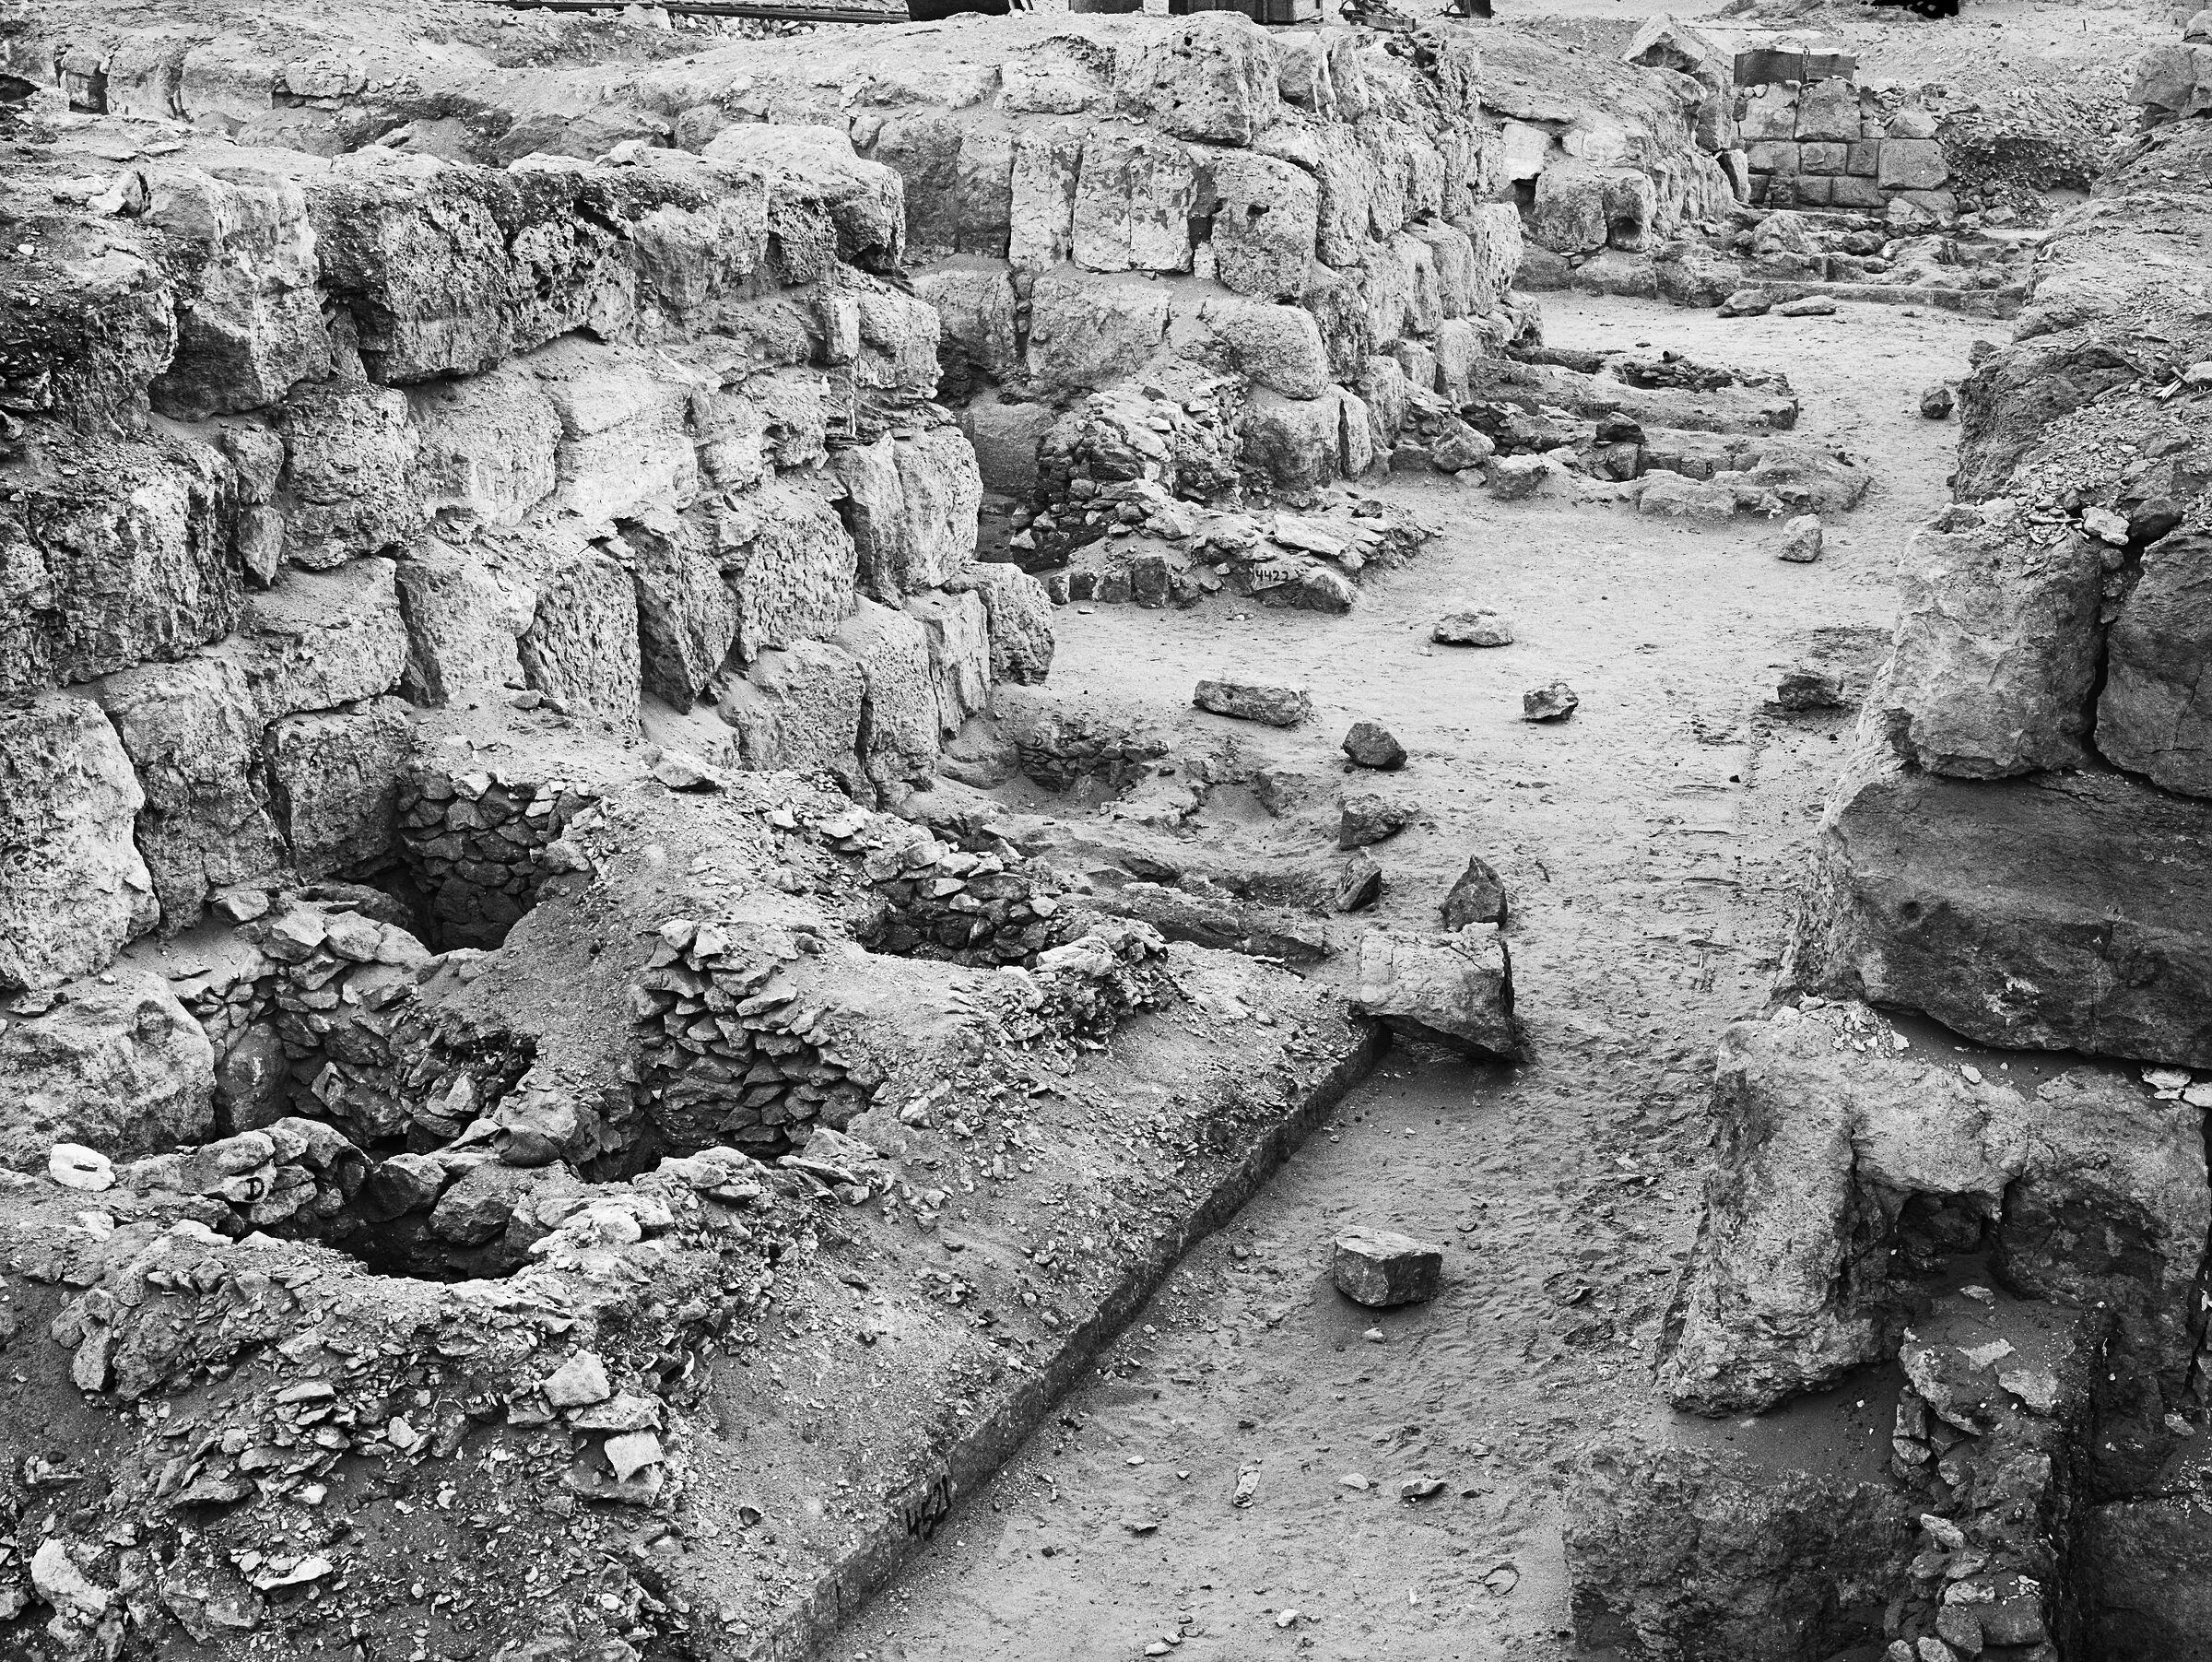 Western Cemetery: Site: Giza; View: G 4520, G 4530, G 4522, G 4521, G 4524